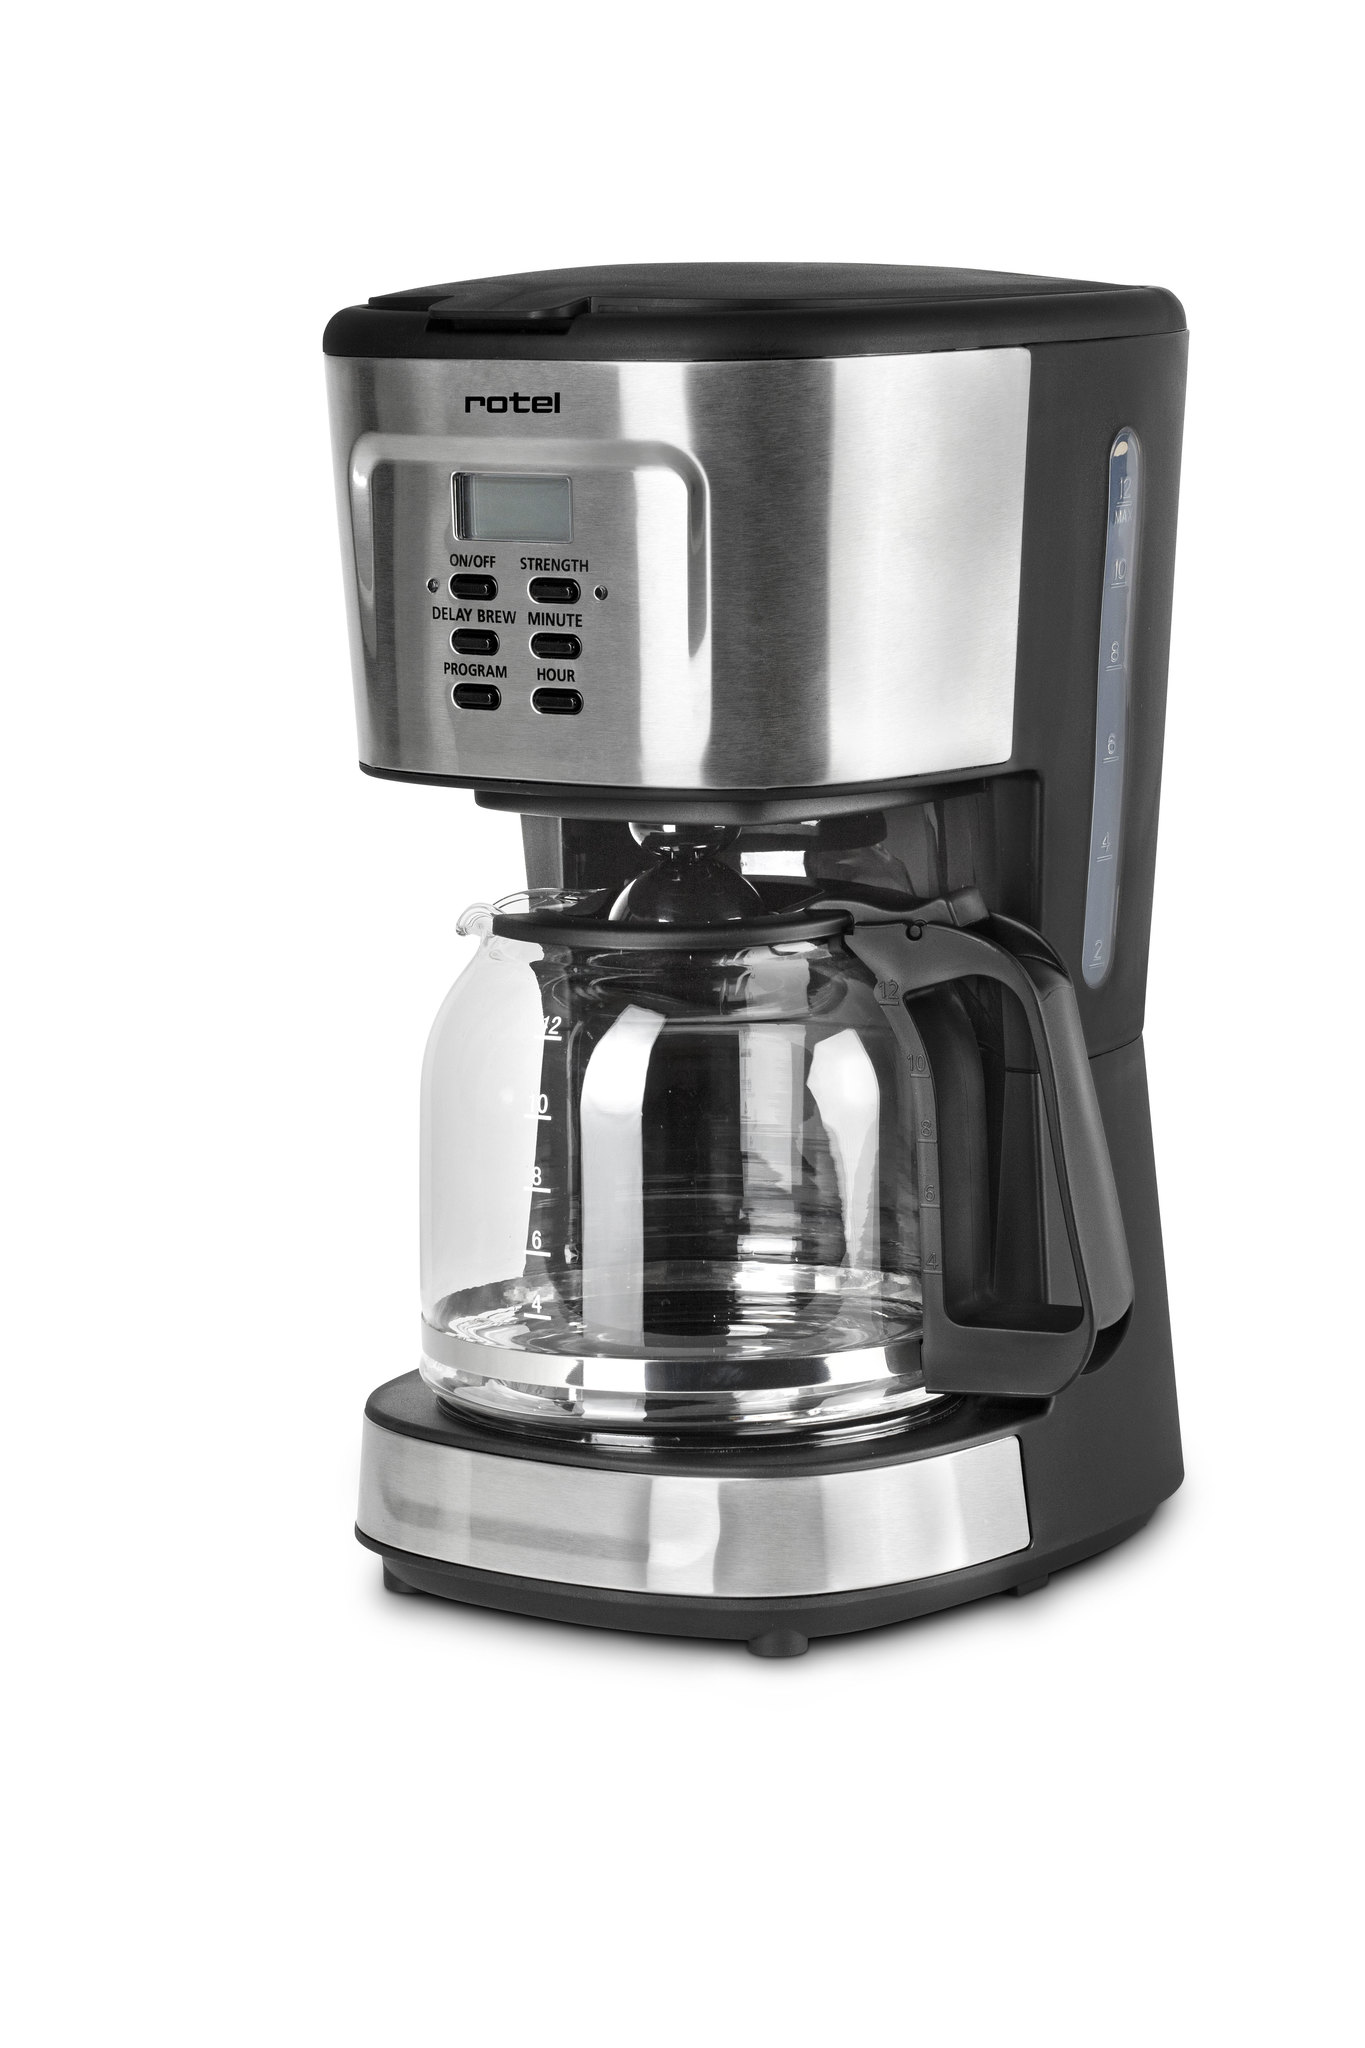 rotel Filterkaffeemaschine 1.5 Liter